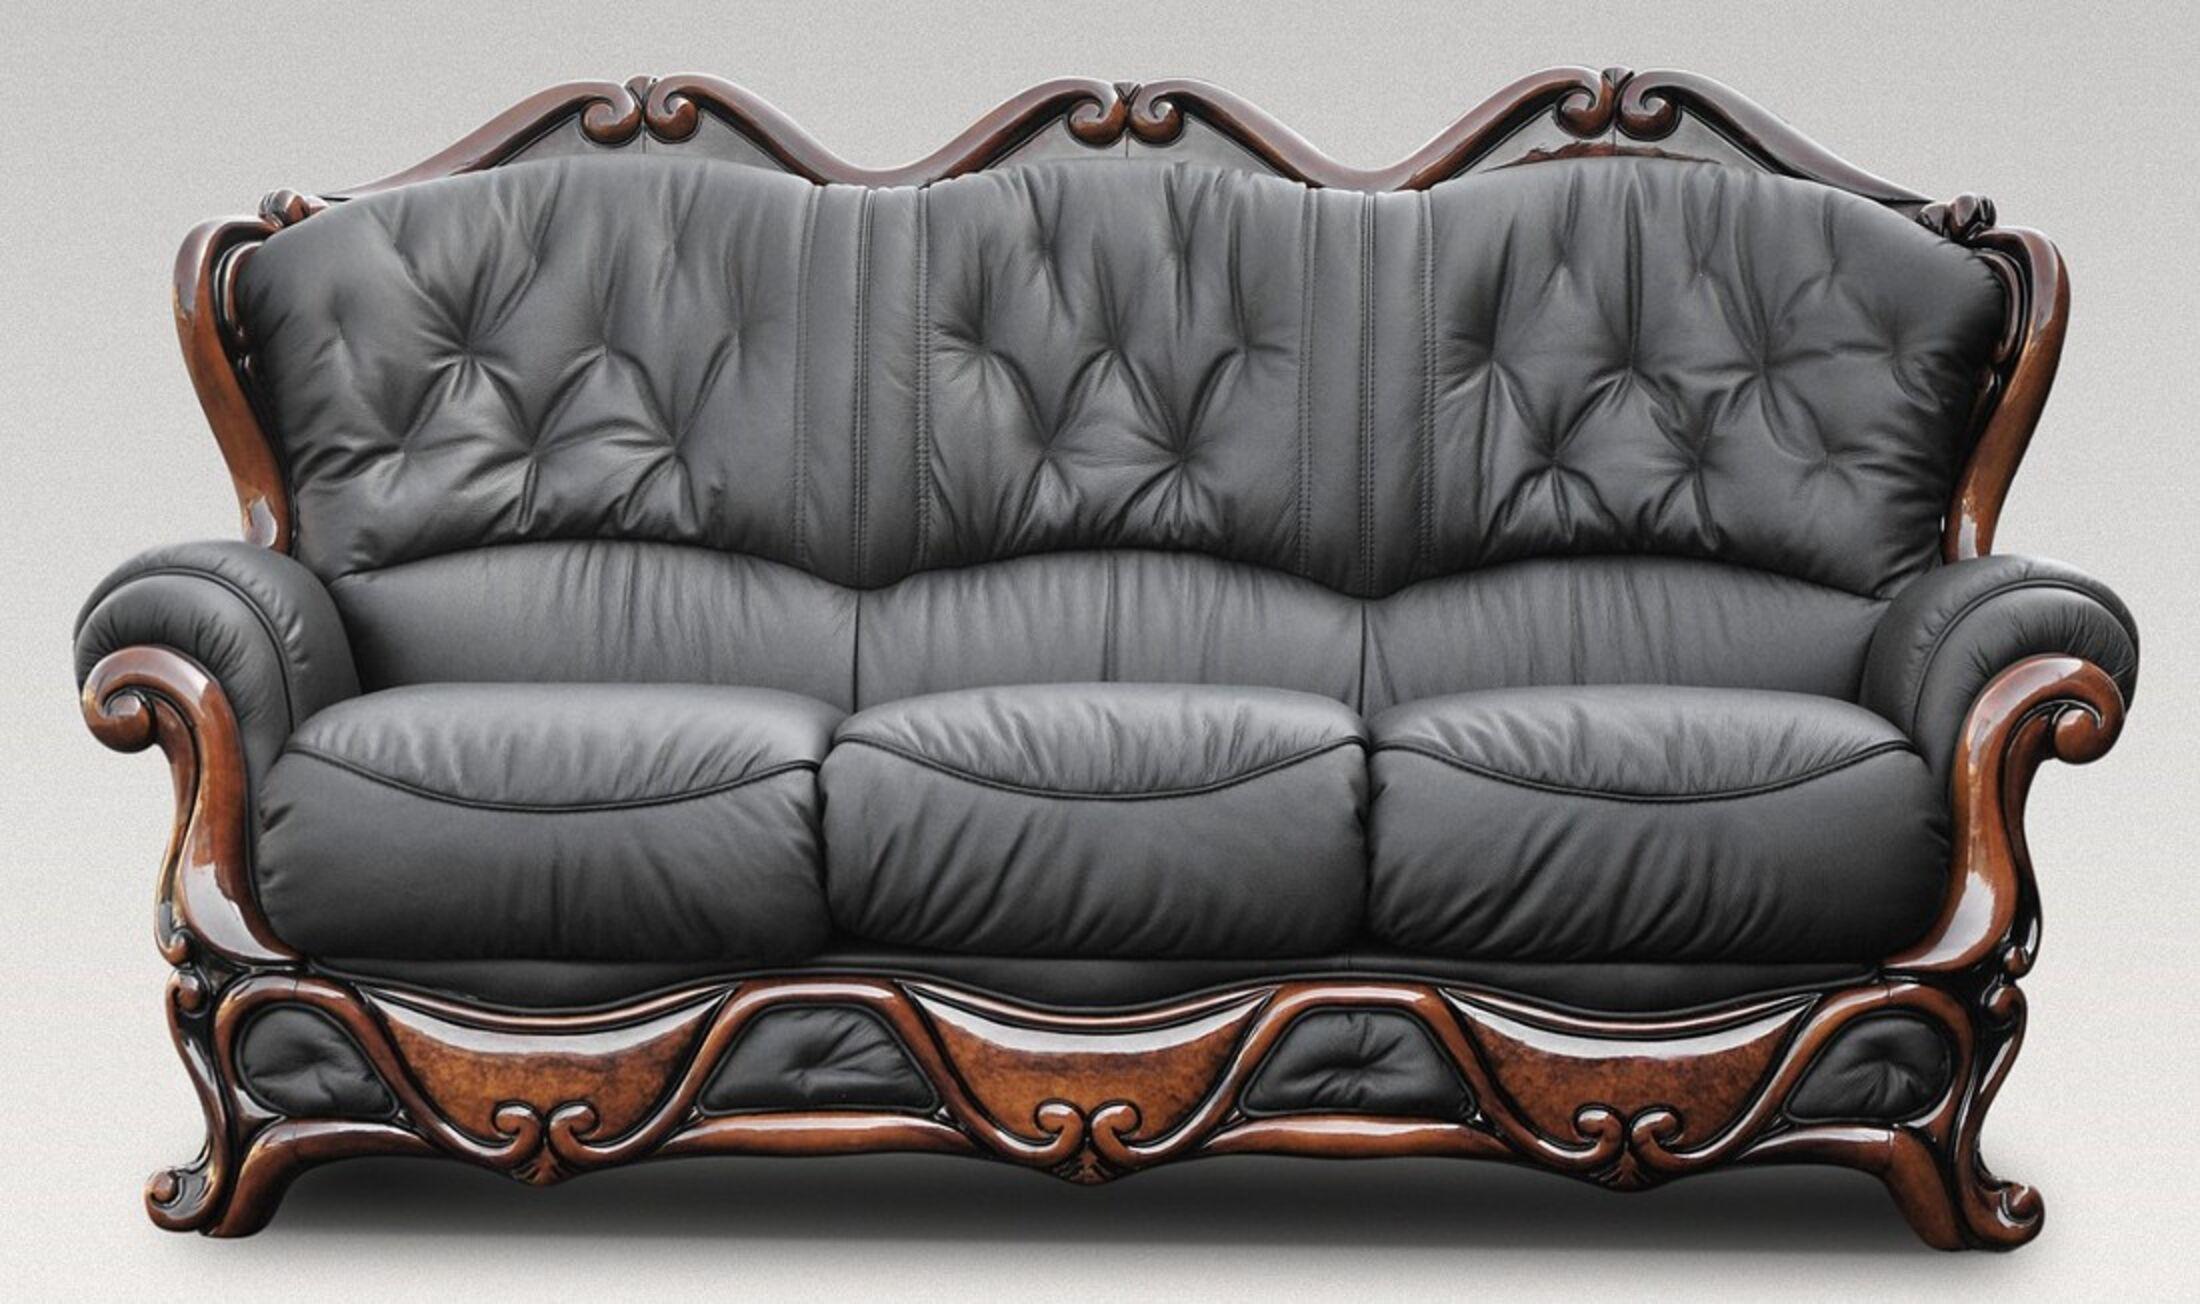 Dante 3 Seater Italian Leather Sofa Settee Offer Black